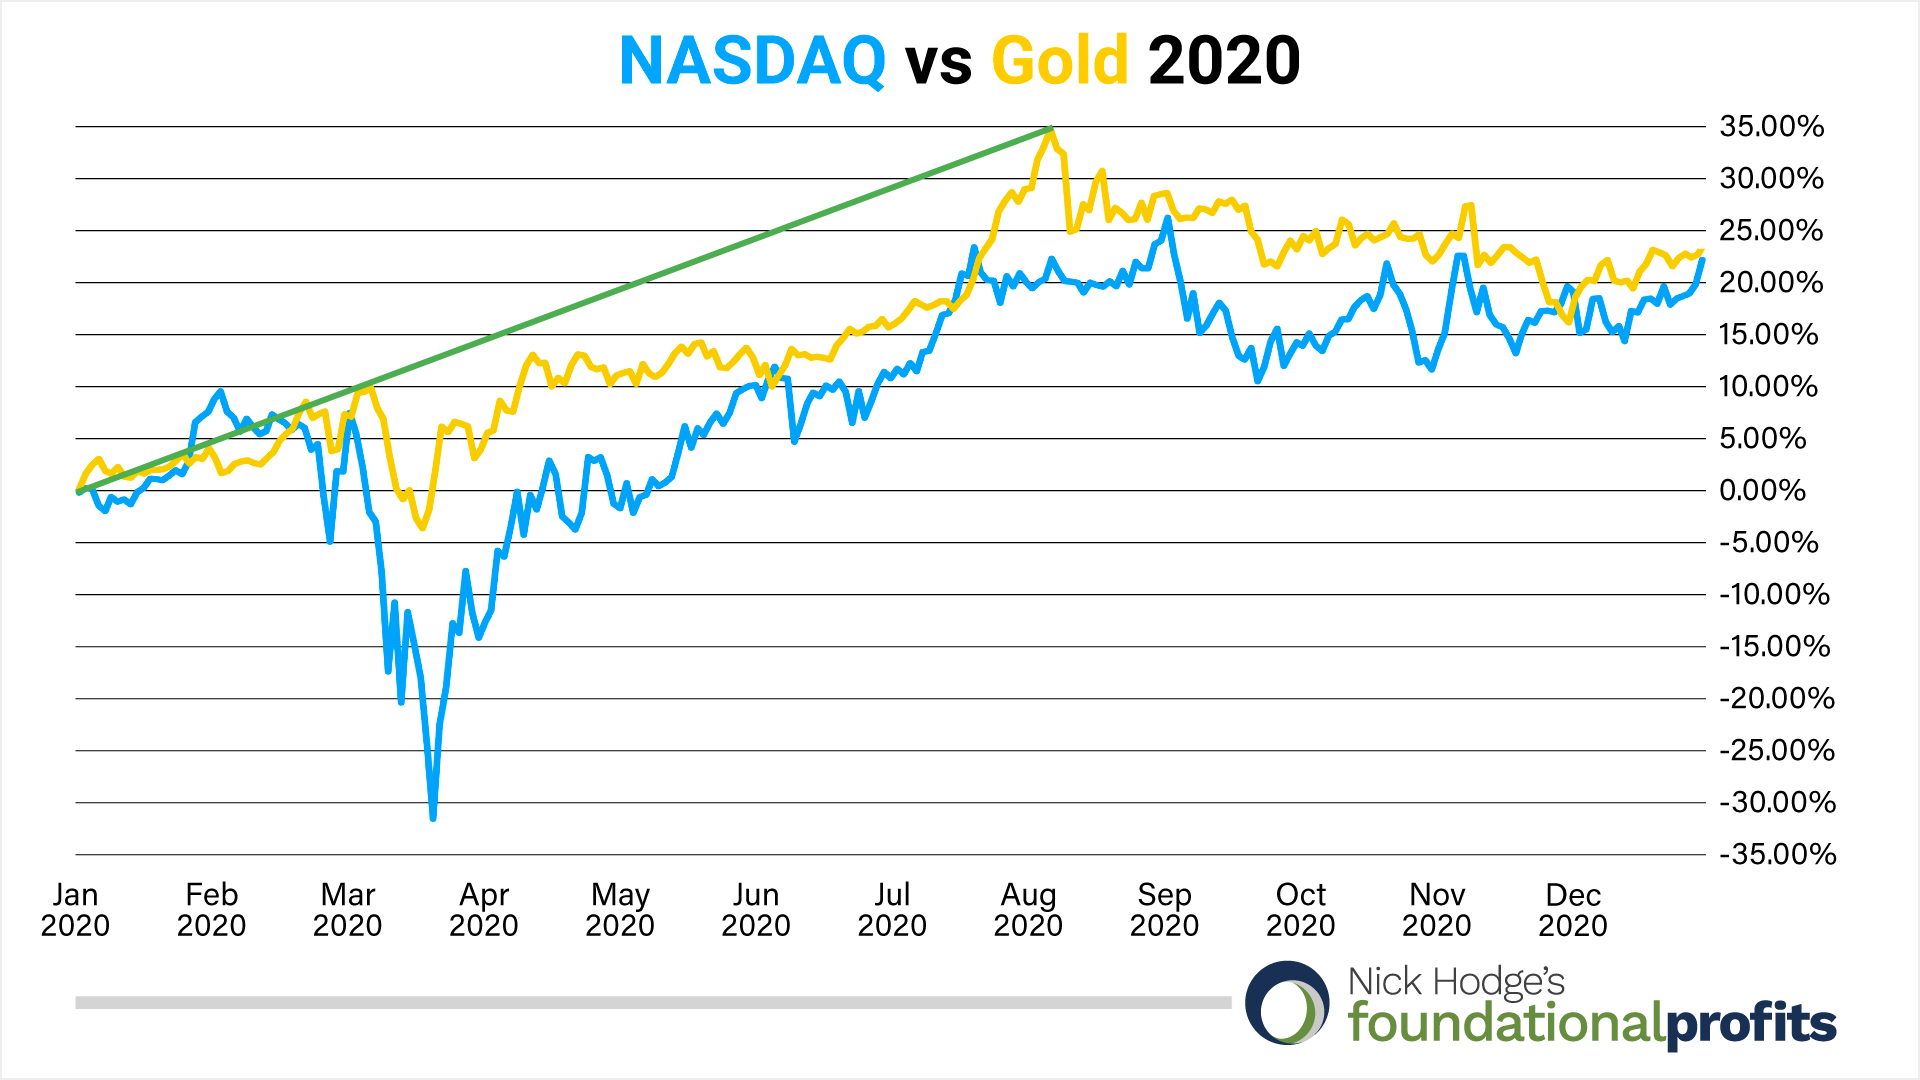 nasdaq-vs-gold-2020